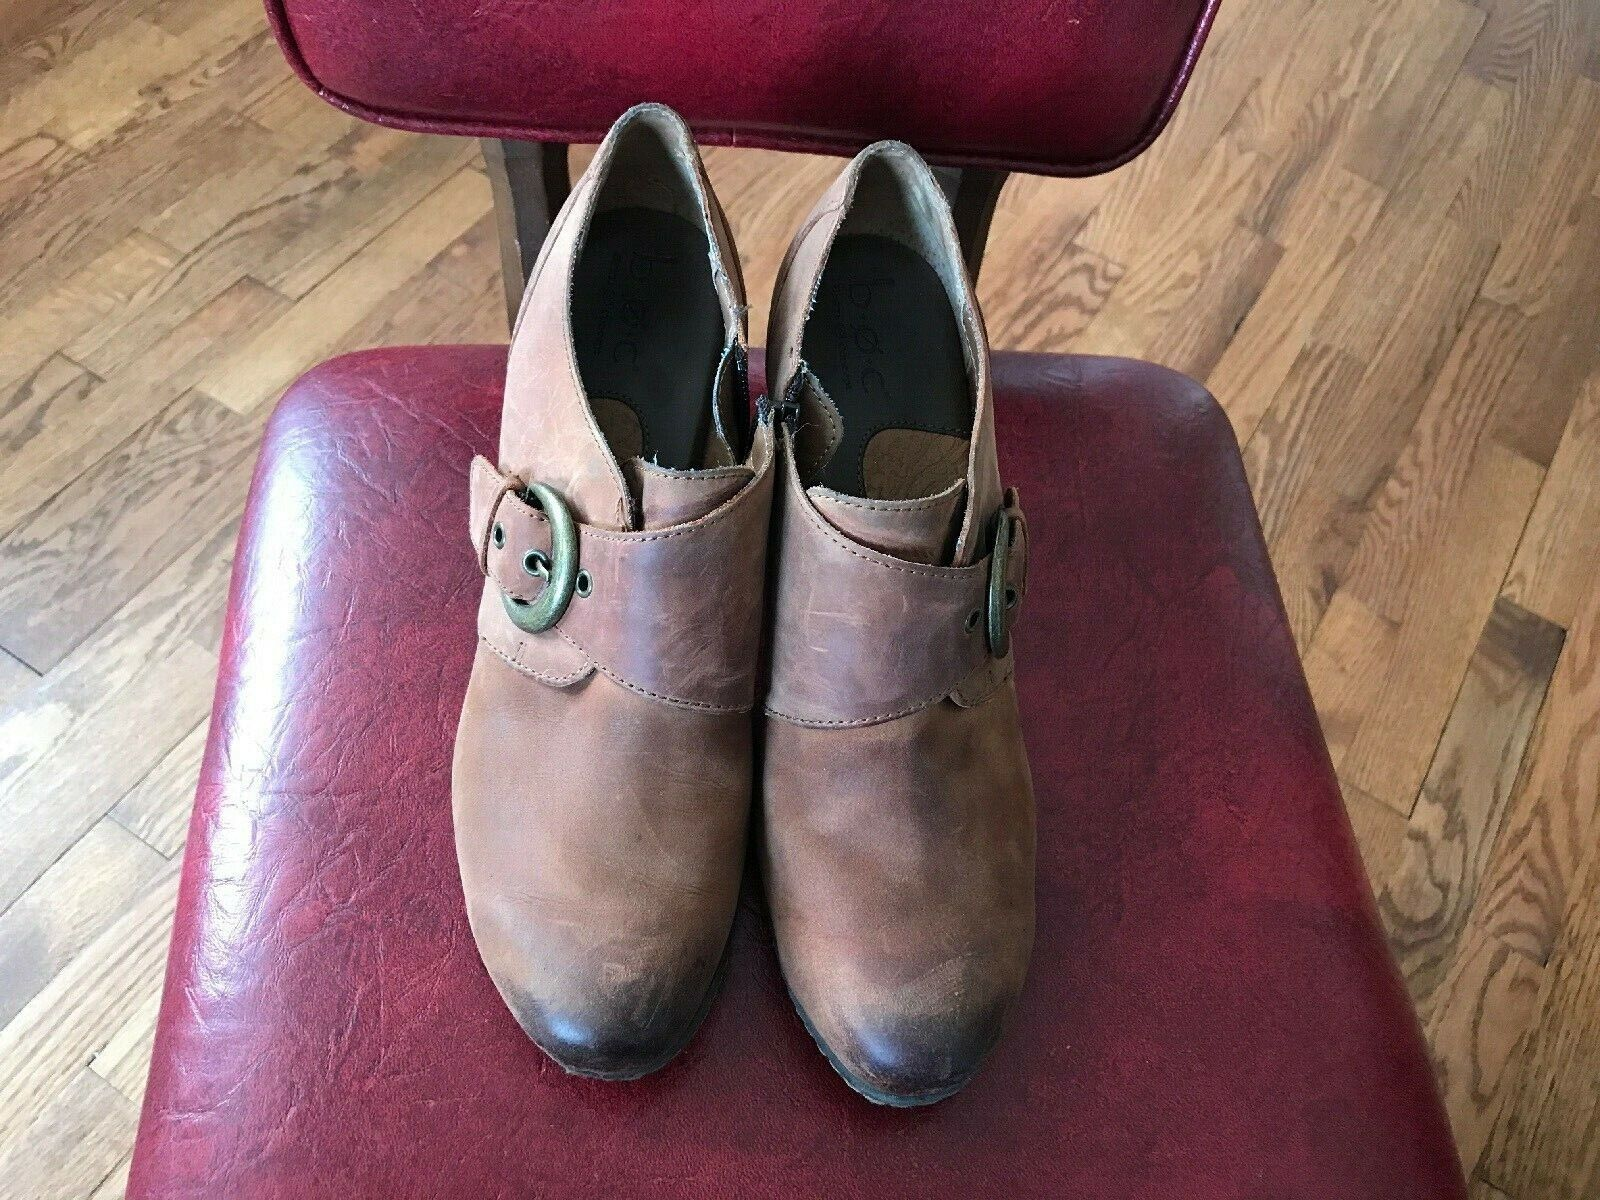 BOC Born Women's Leather Ankle Heels Brown Boots Size 9 US 40.5 EU Zipper Side